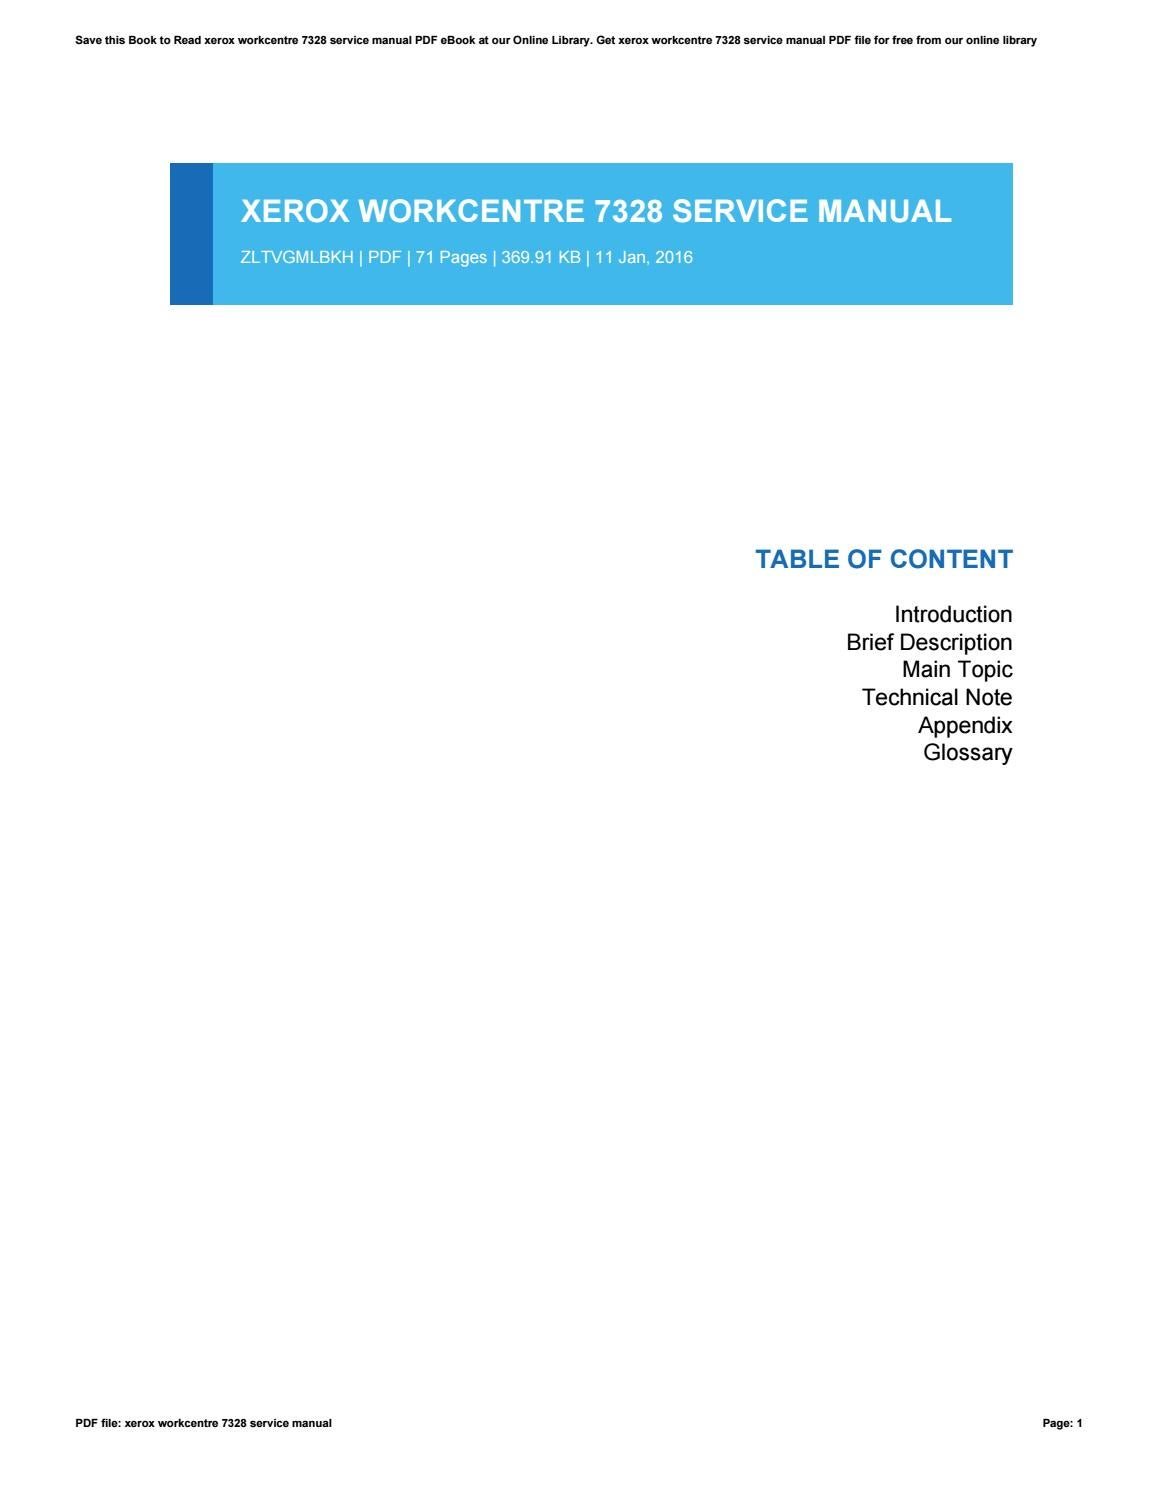 xerox workcentre 7328 service manual pdf